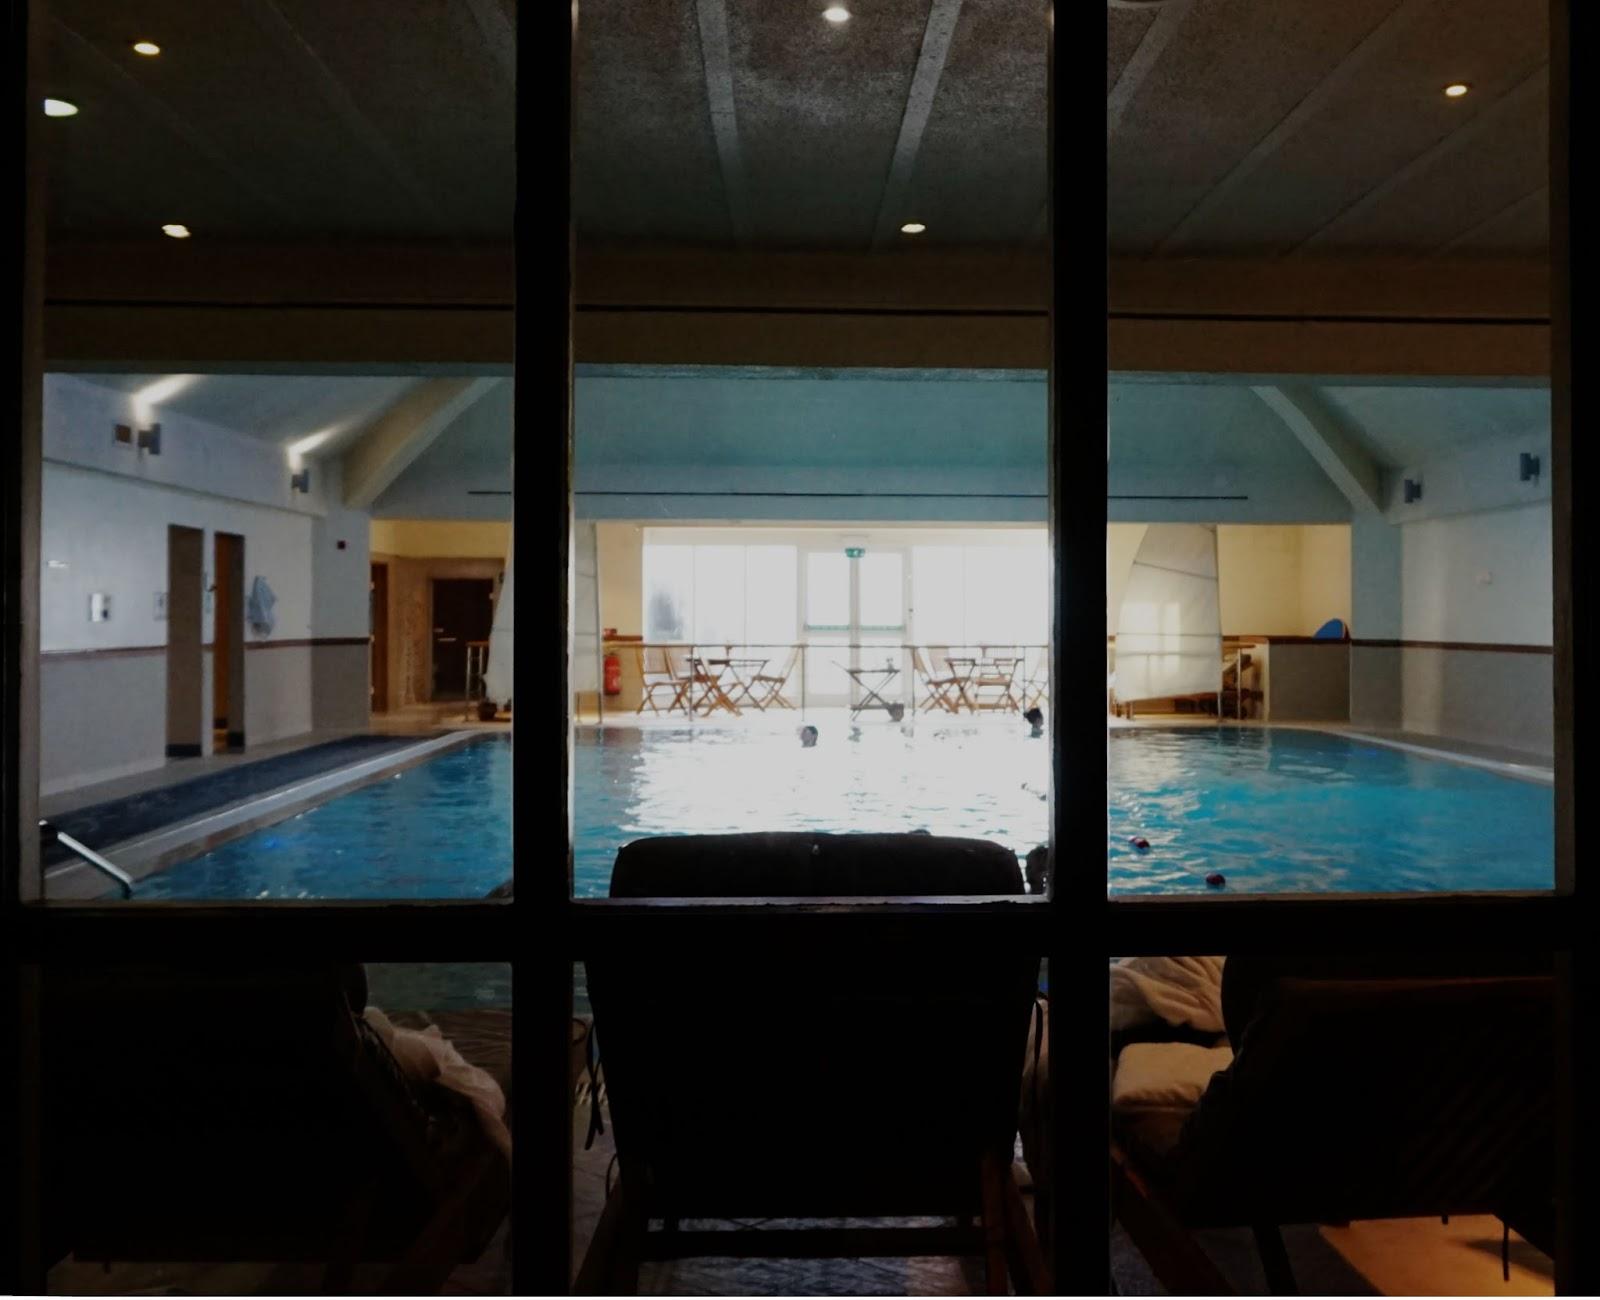 bristol aztec hotel and spa swimming pool spa area